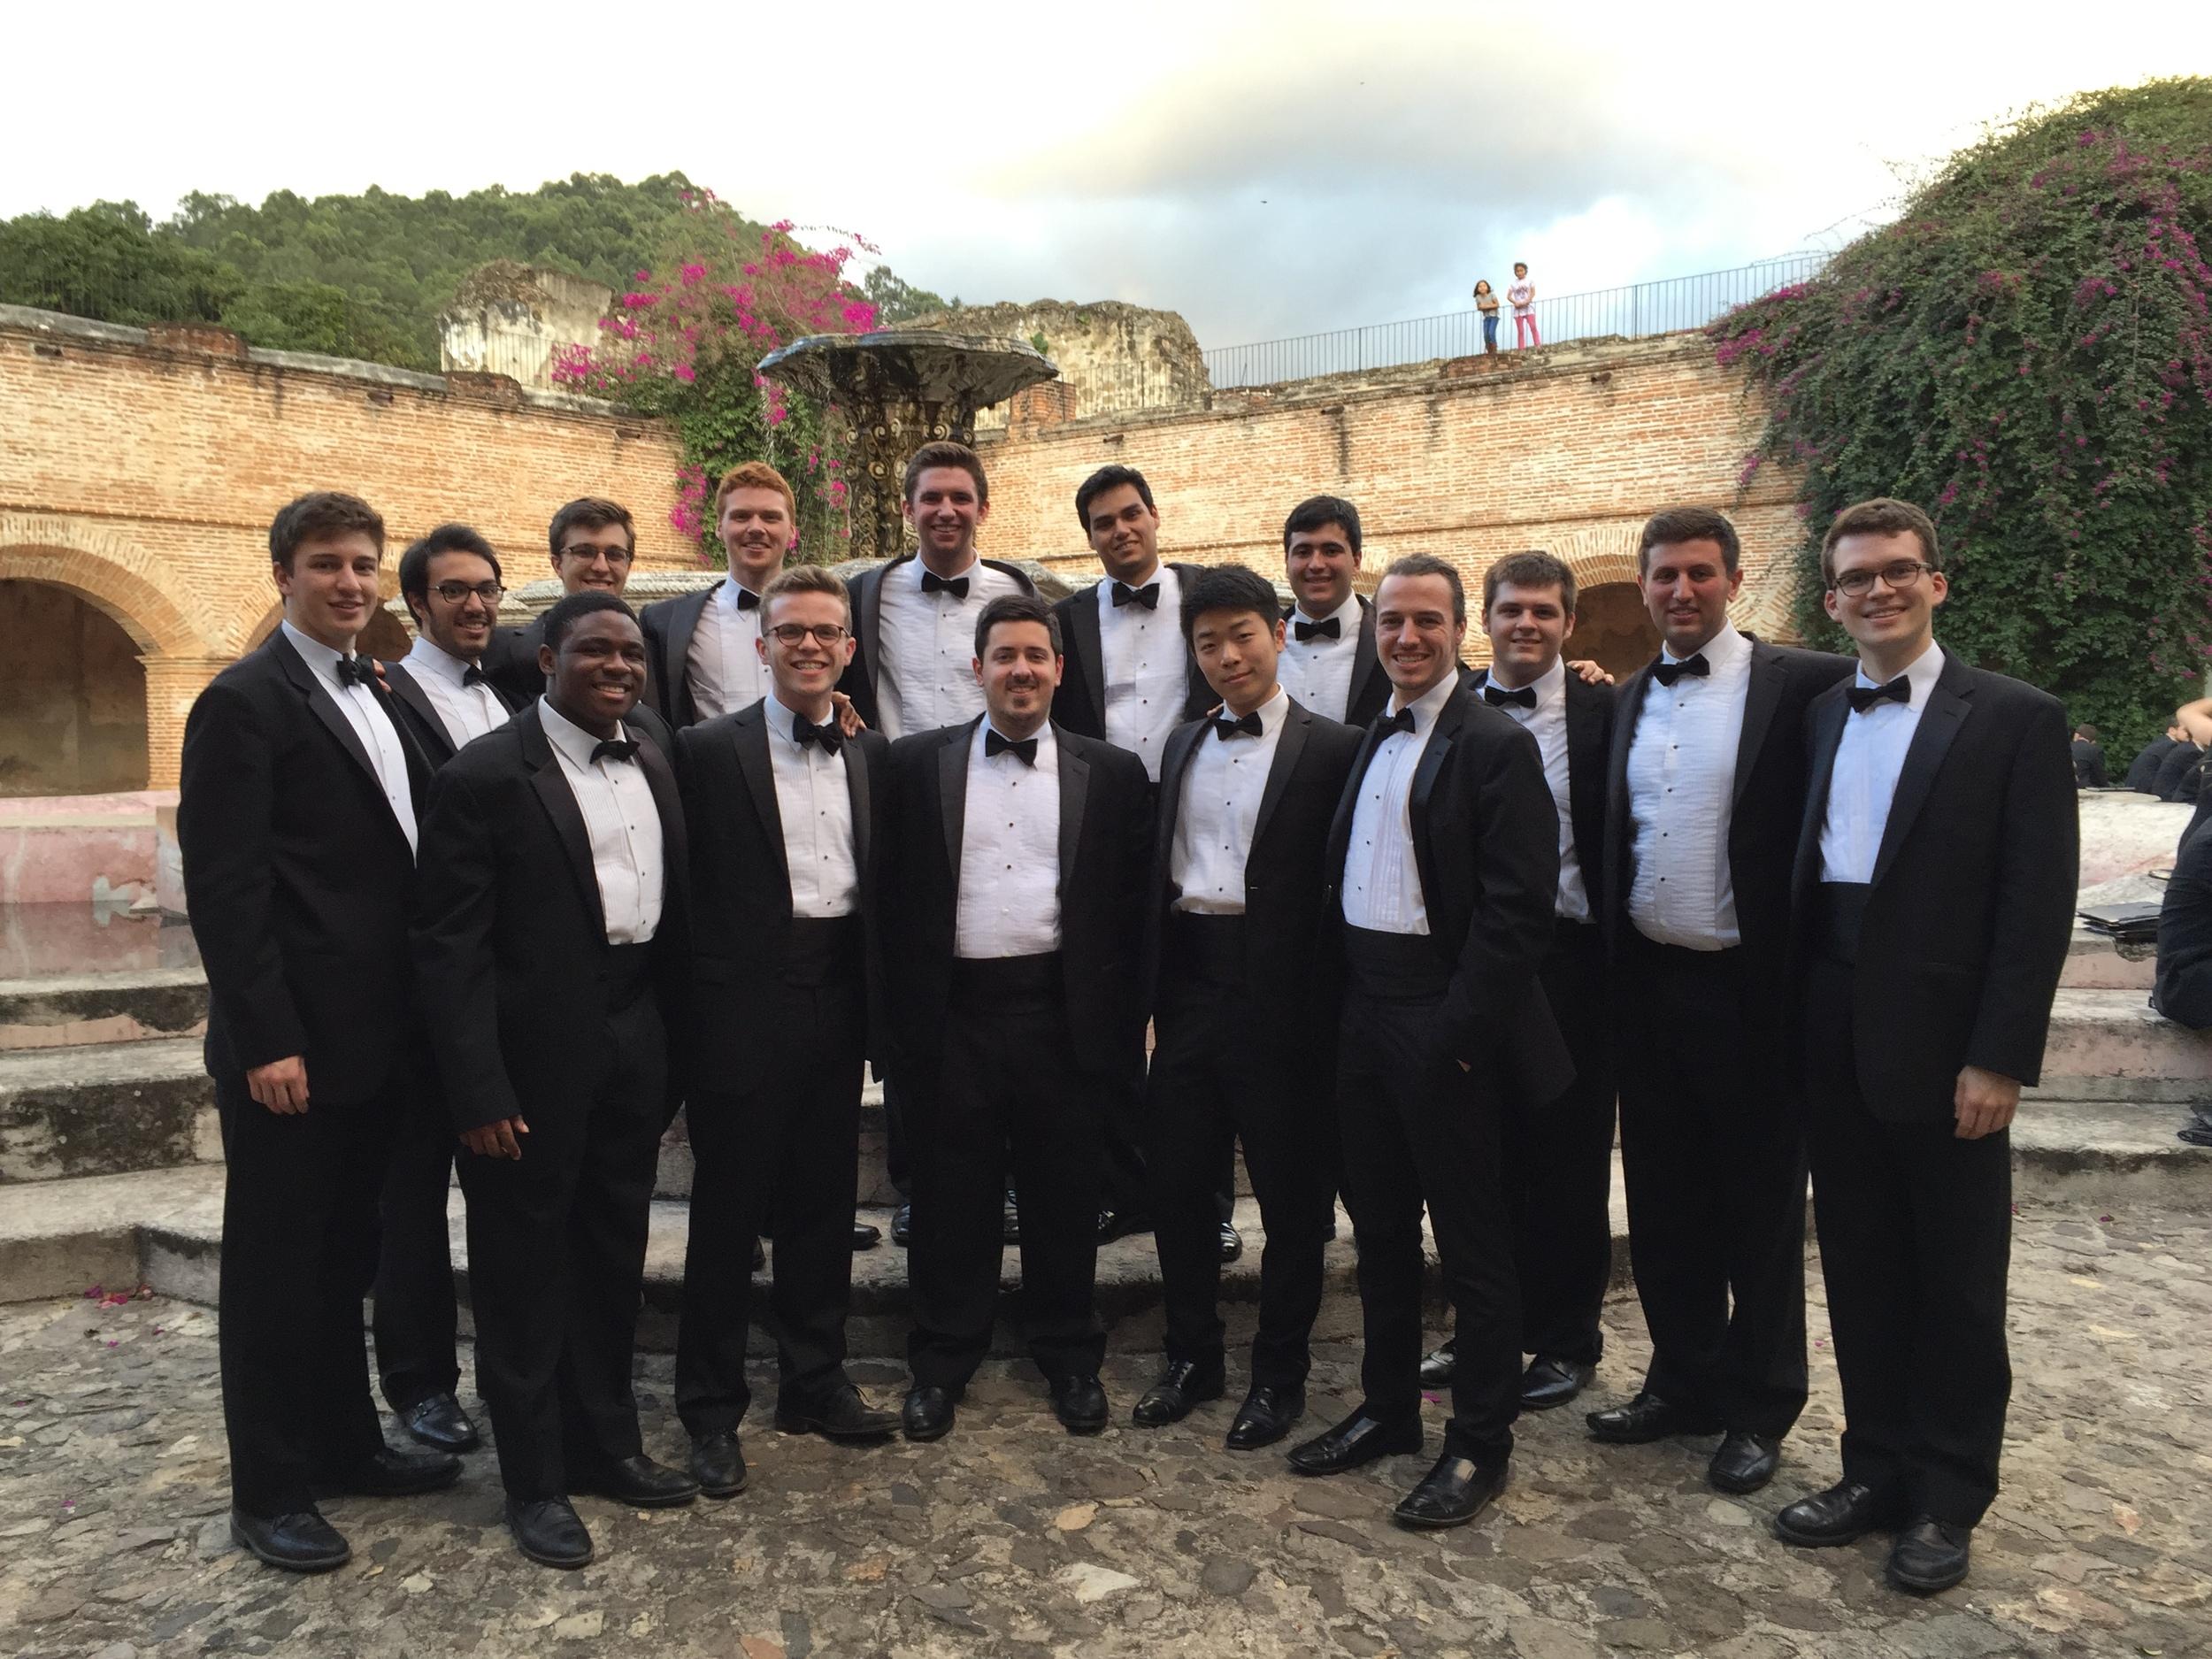 The group at Iglesia de La Merced in Antigua, Guatemala.